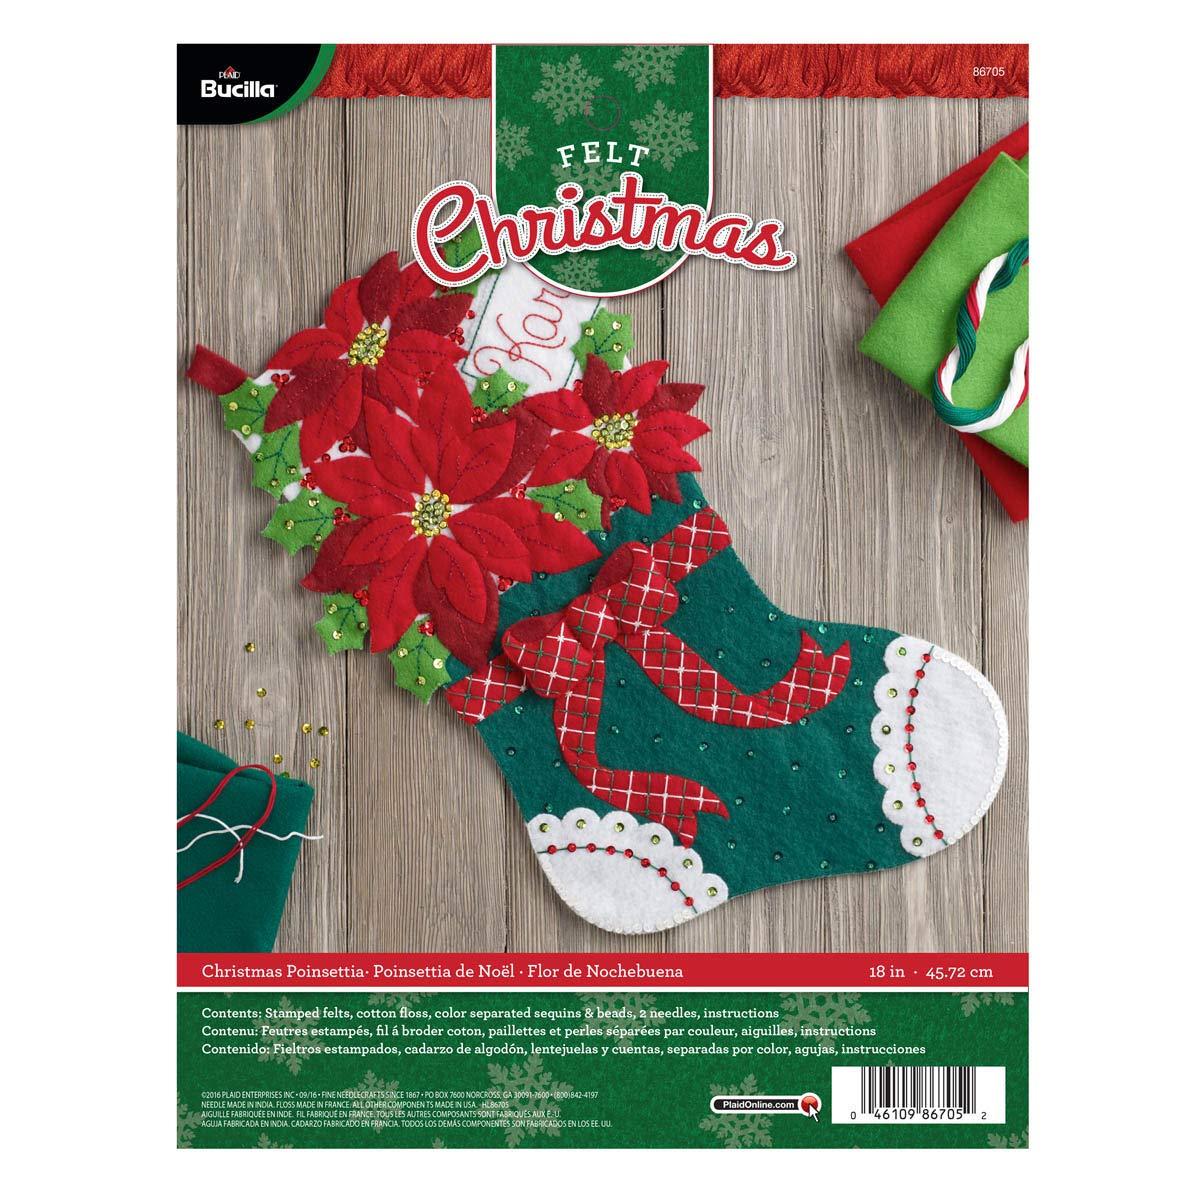 Bucilla Felt Applique Stocking Kit (18-Inch), 86705 Christmas Poinsettia